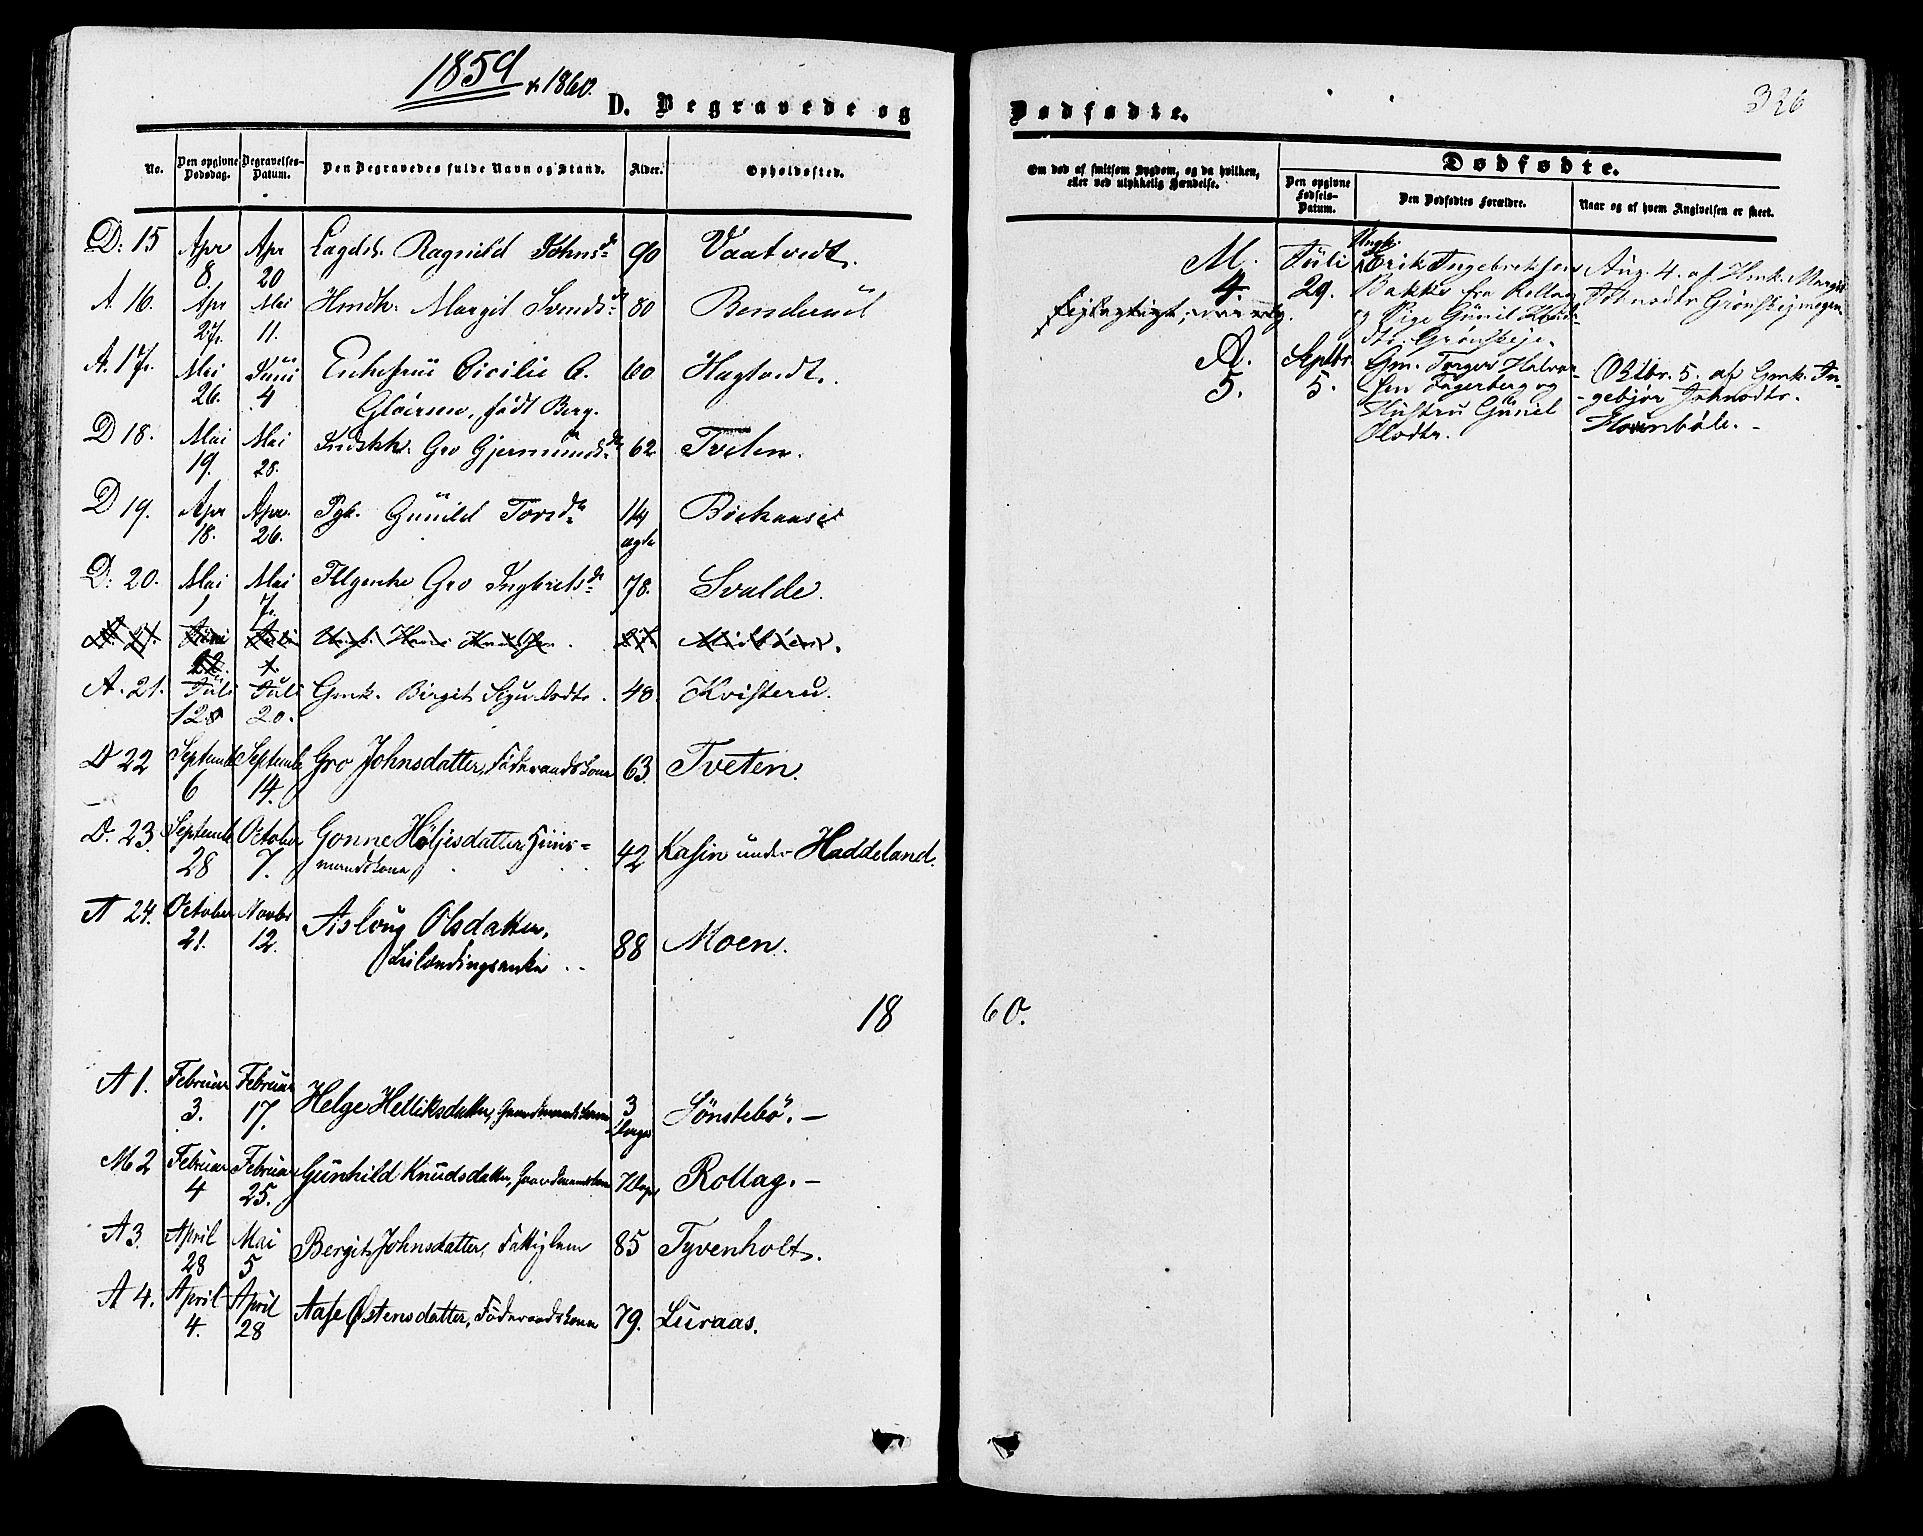 SAKO, Tinn kirkebøker, F/Fa/L0006: Ministerialbok nr. I 6, 1857-1878, s. 326